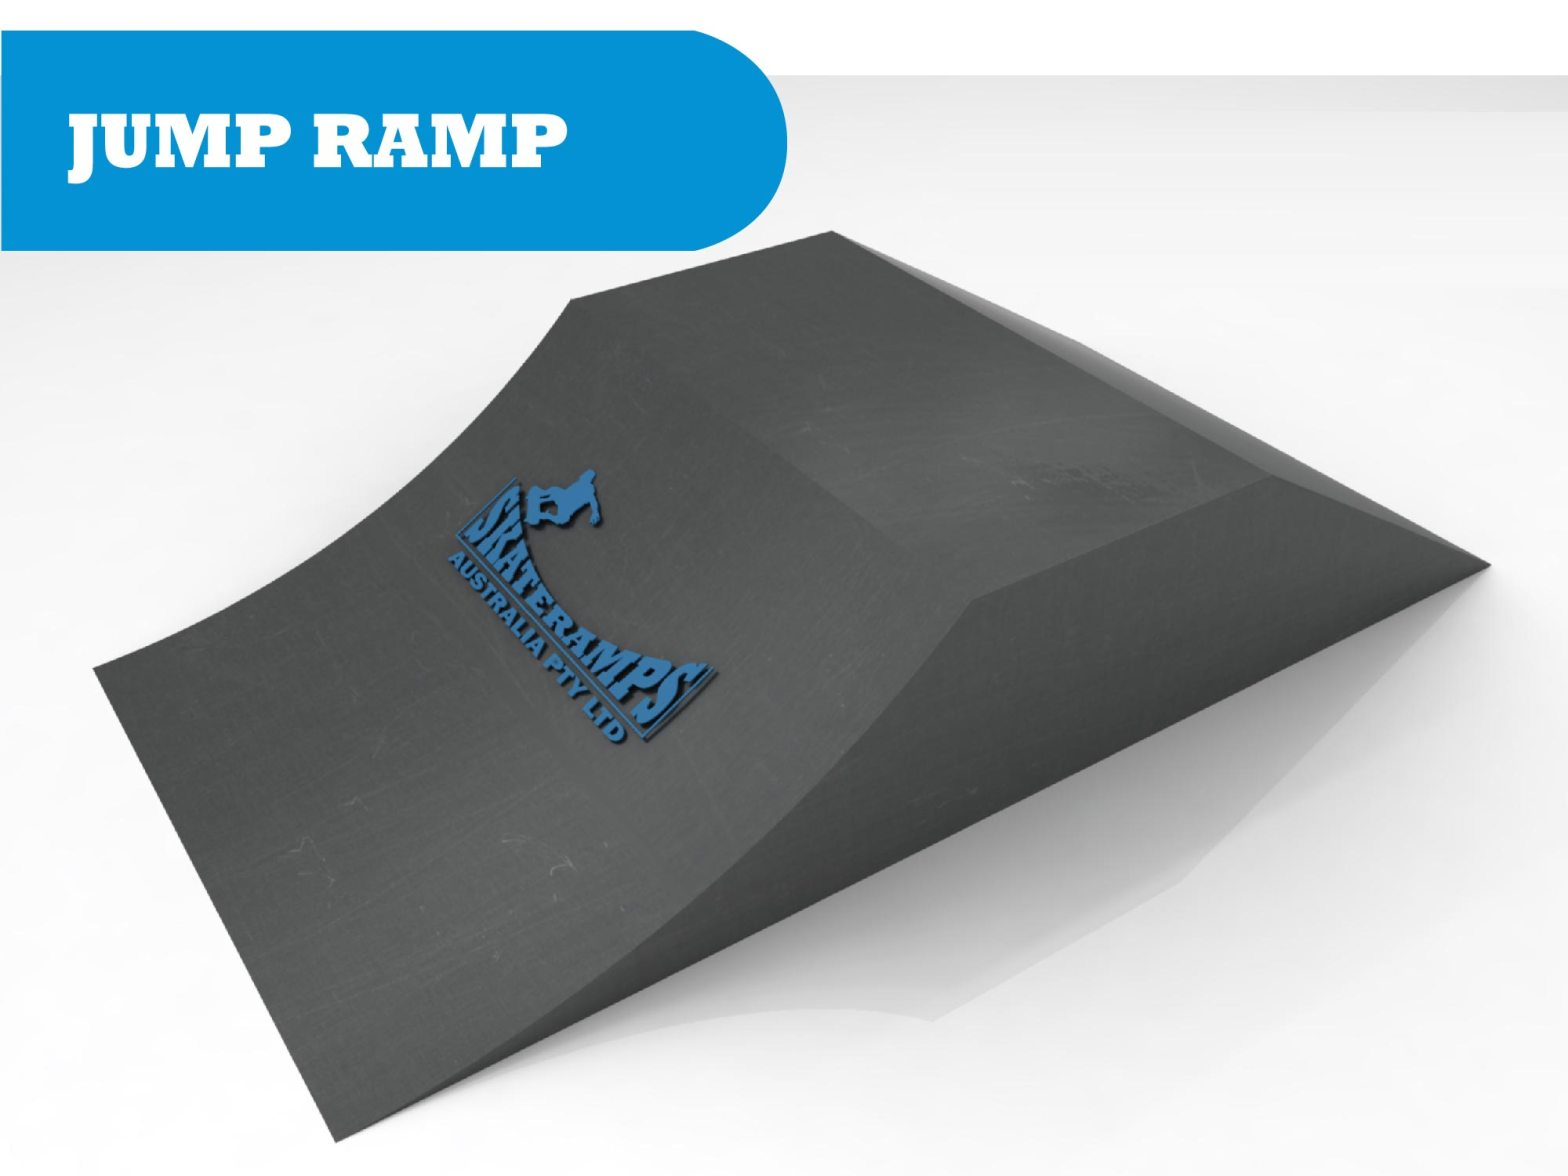 Jump ramp skate ramp module